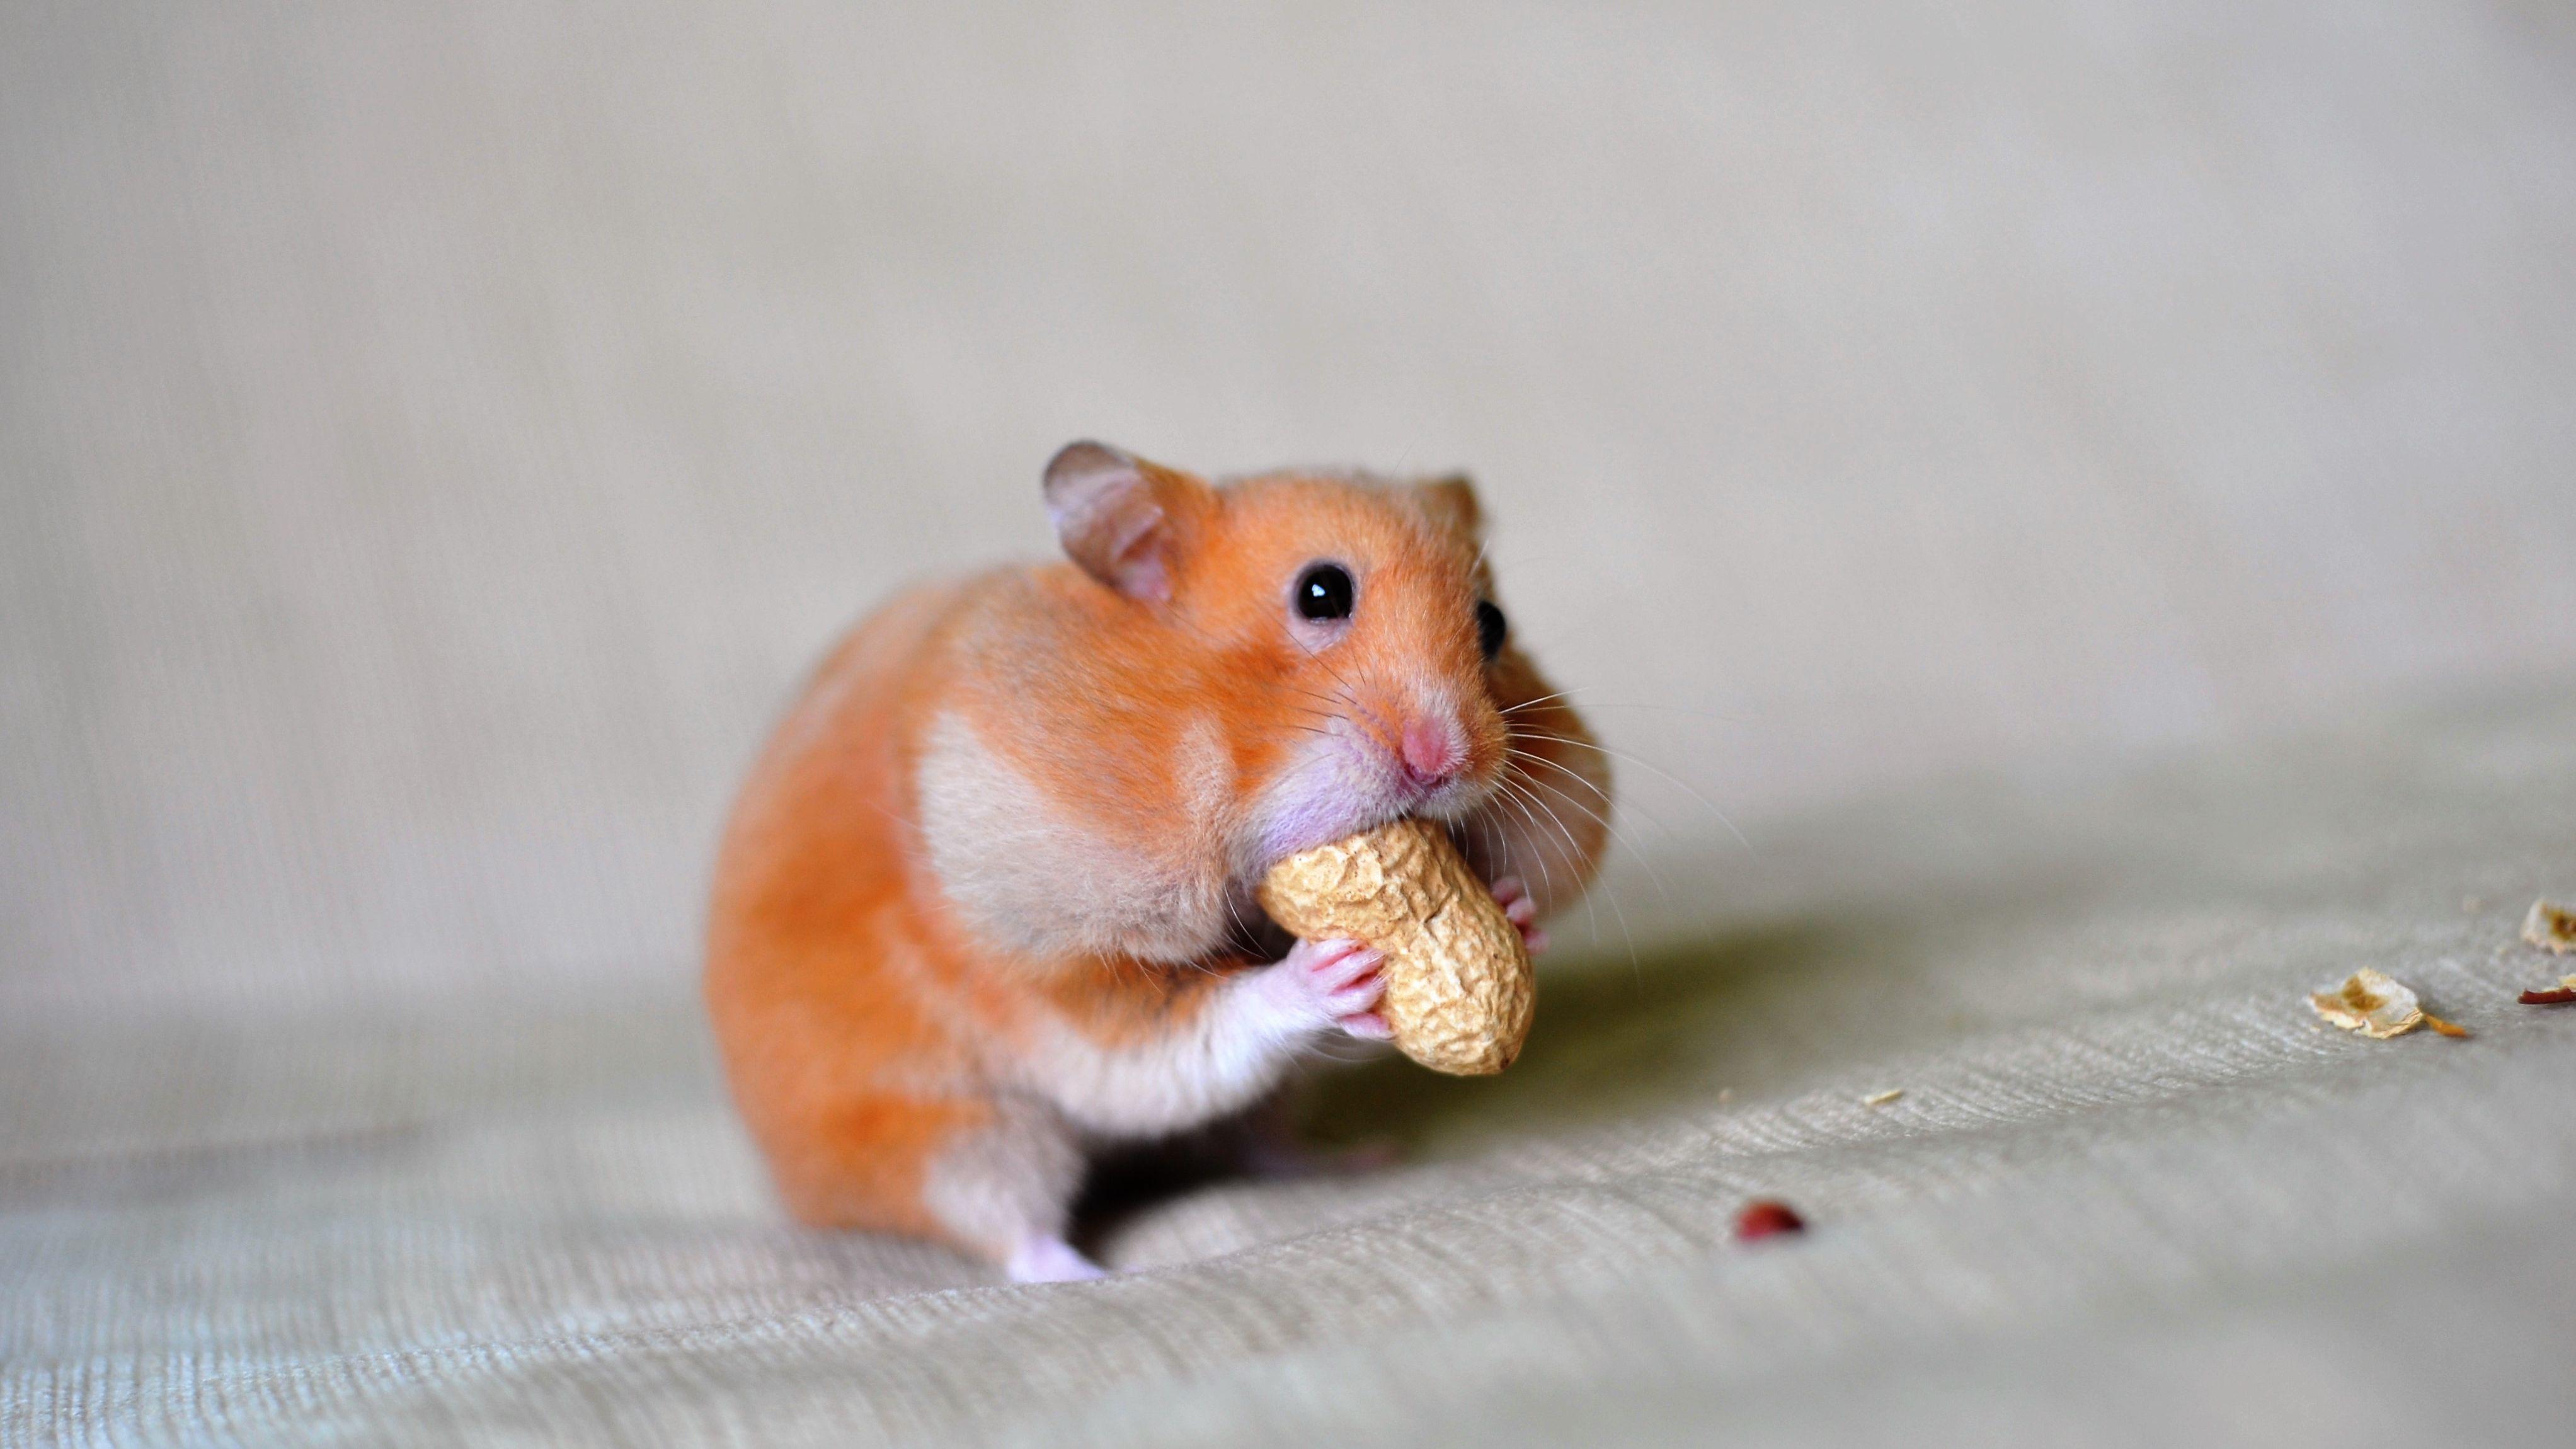 Hamster photos